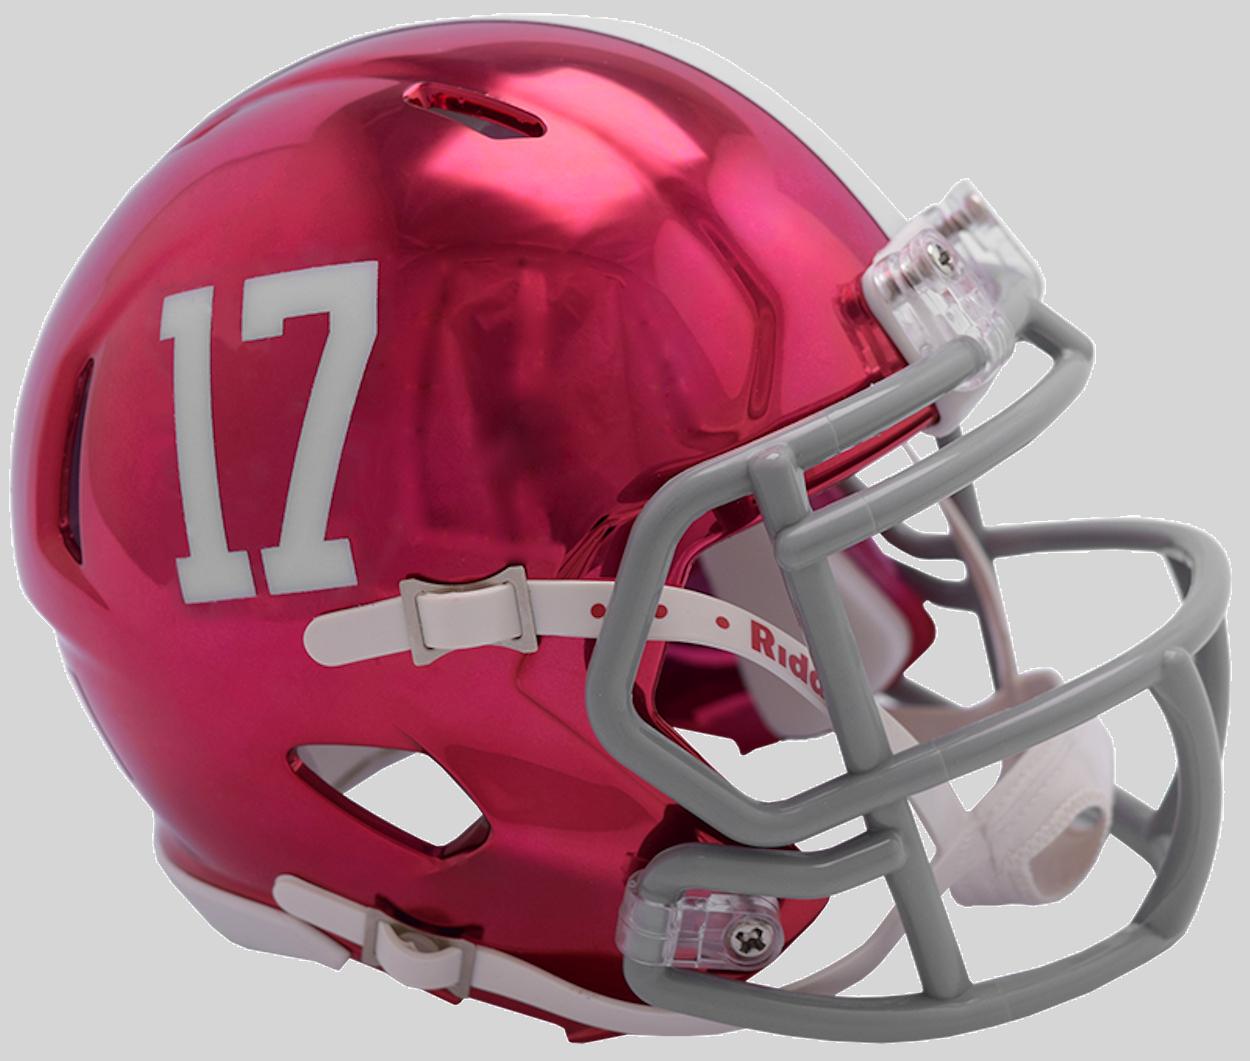 Speed Clc Alab Http Www 757sc Com Products Speed Clc Alabama Chrome Mini Helmet Utm Campaign Socia Mini Football Helmet Football Helmets Mini Footballs